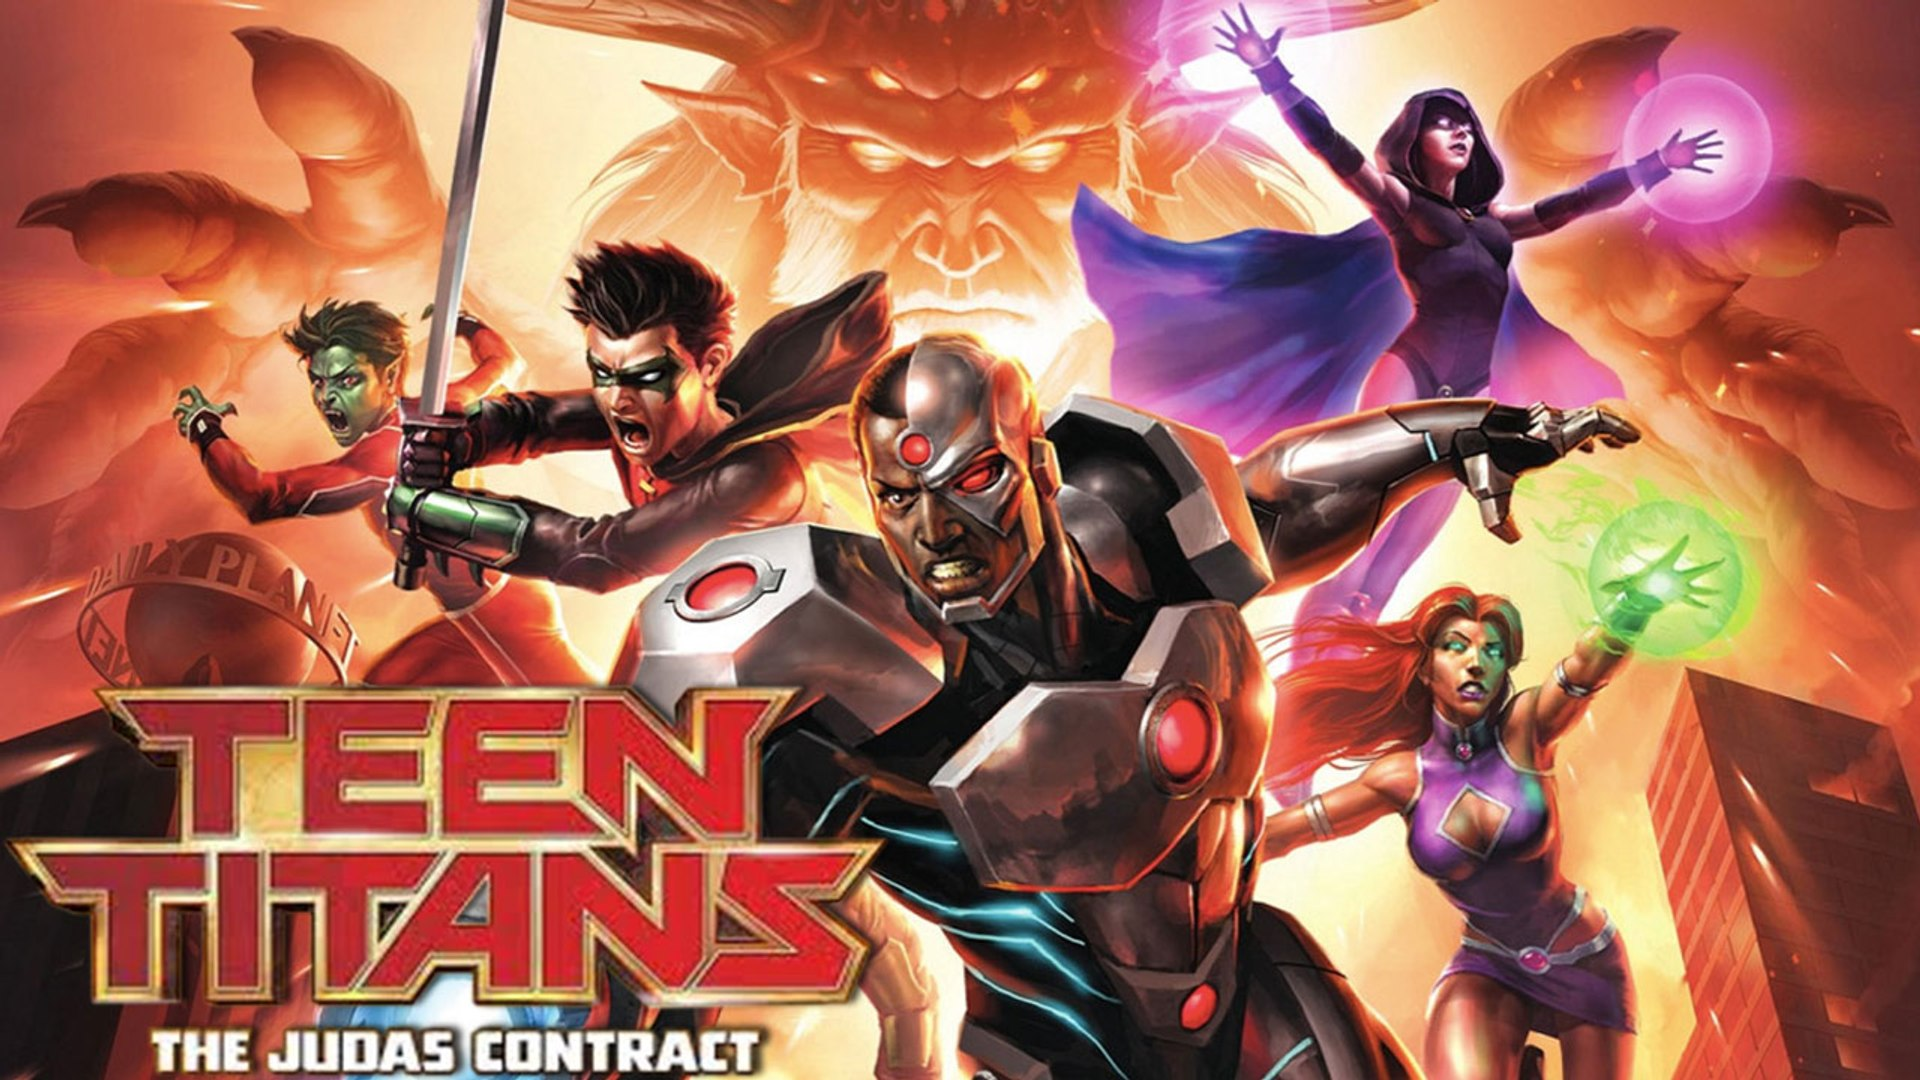 Teen Titans Judas Contract Video Dailymotion